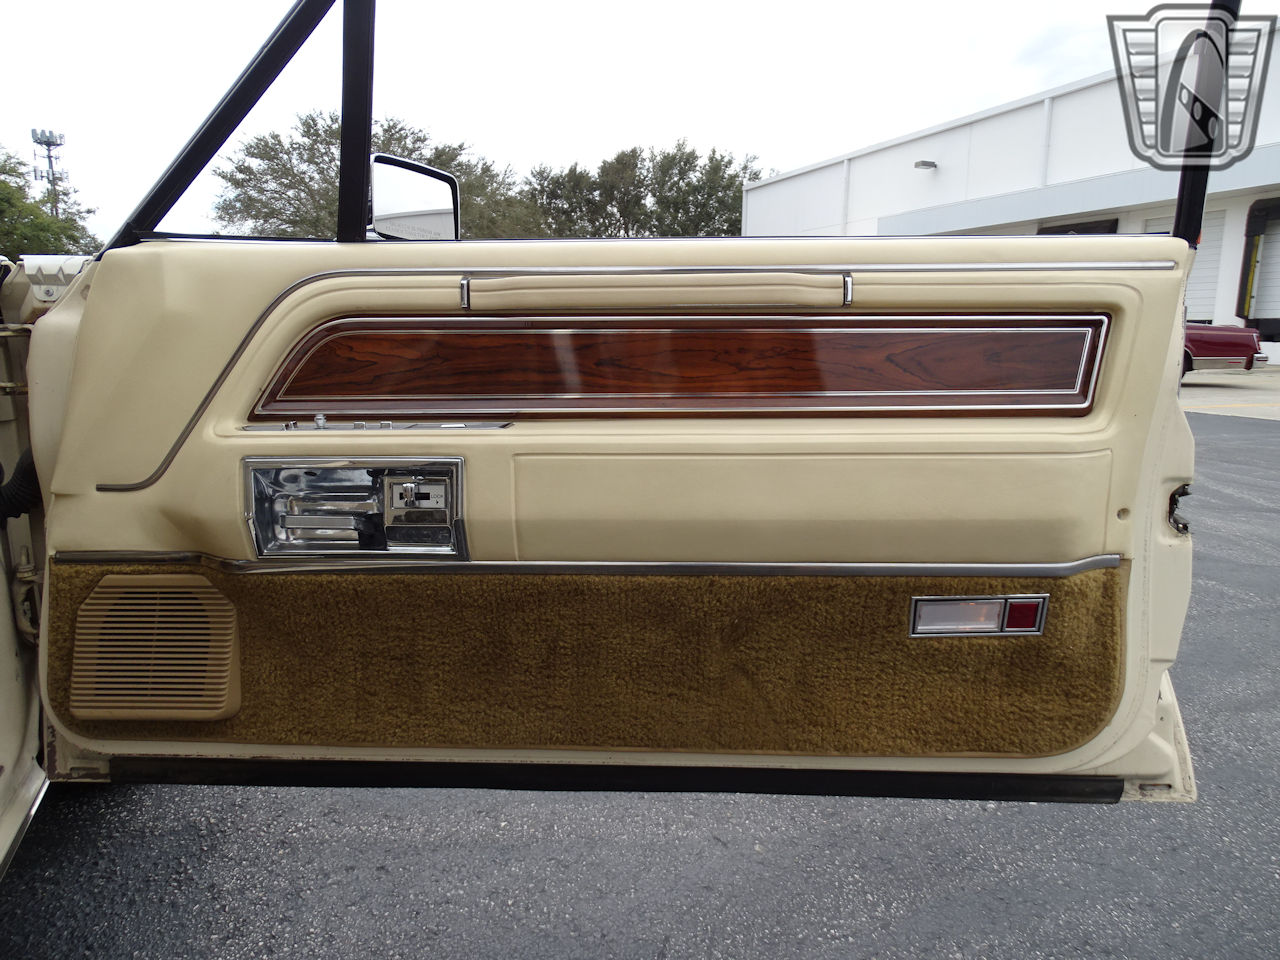 1983 Lincoln Continental 91